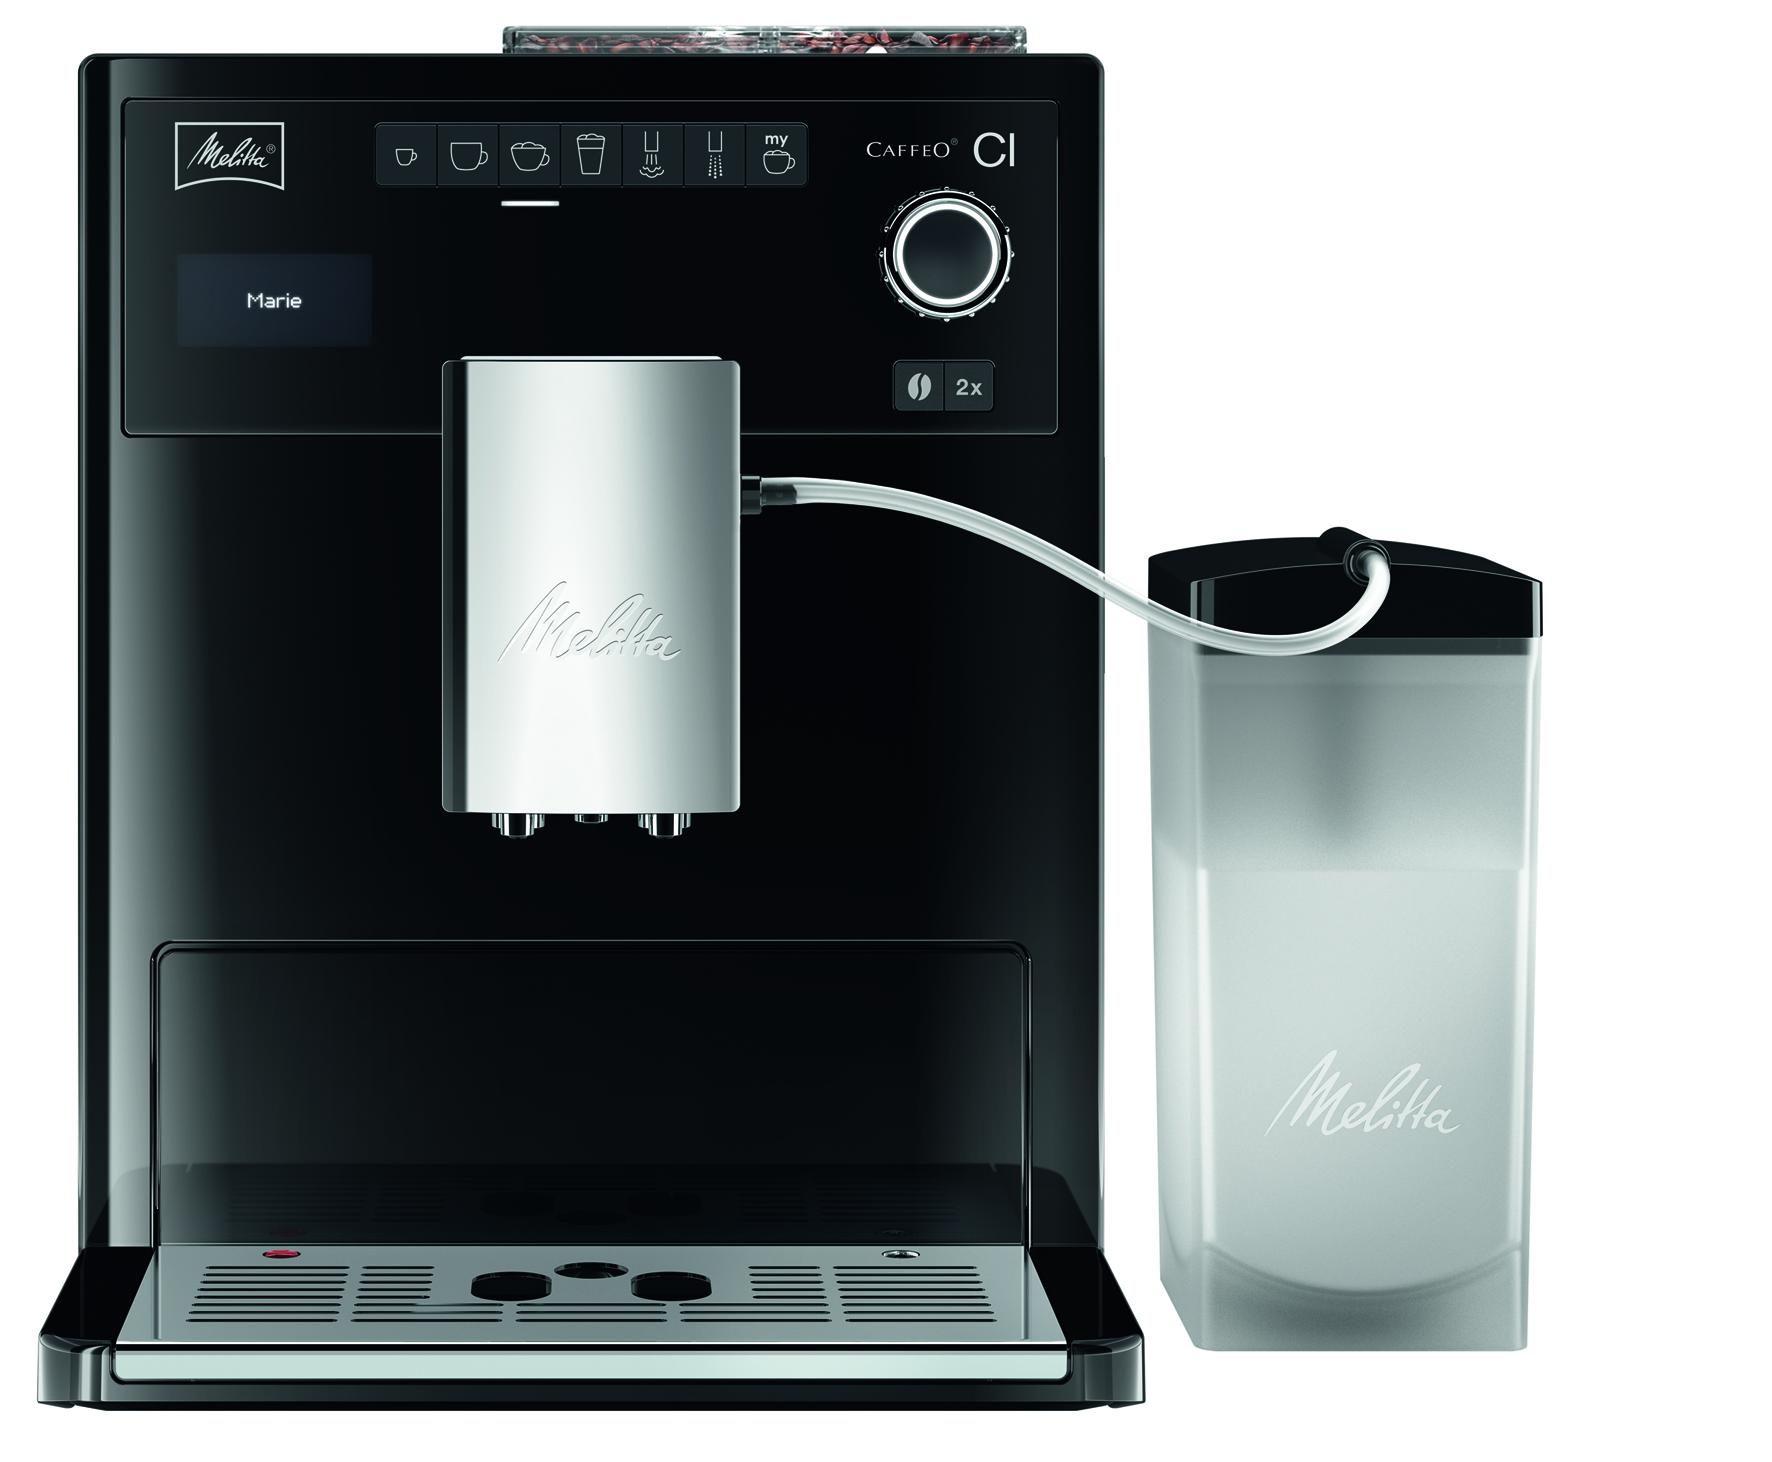 Эспрессо-кофемашина MELITTA CAFFEO CI черная кофемашина melitta 20288